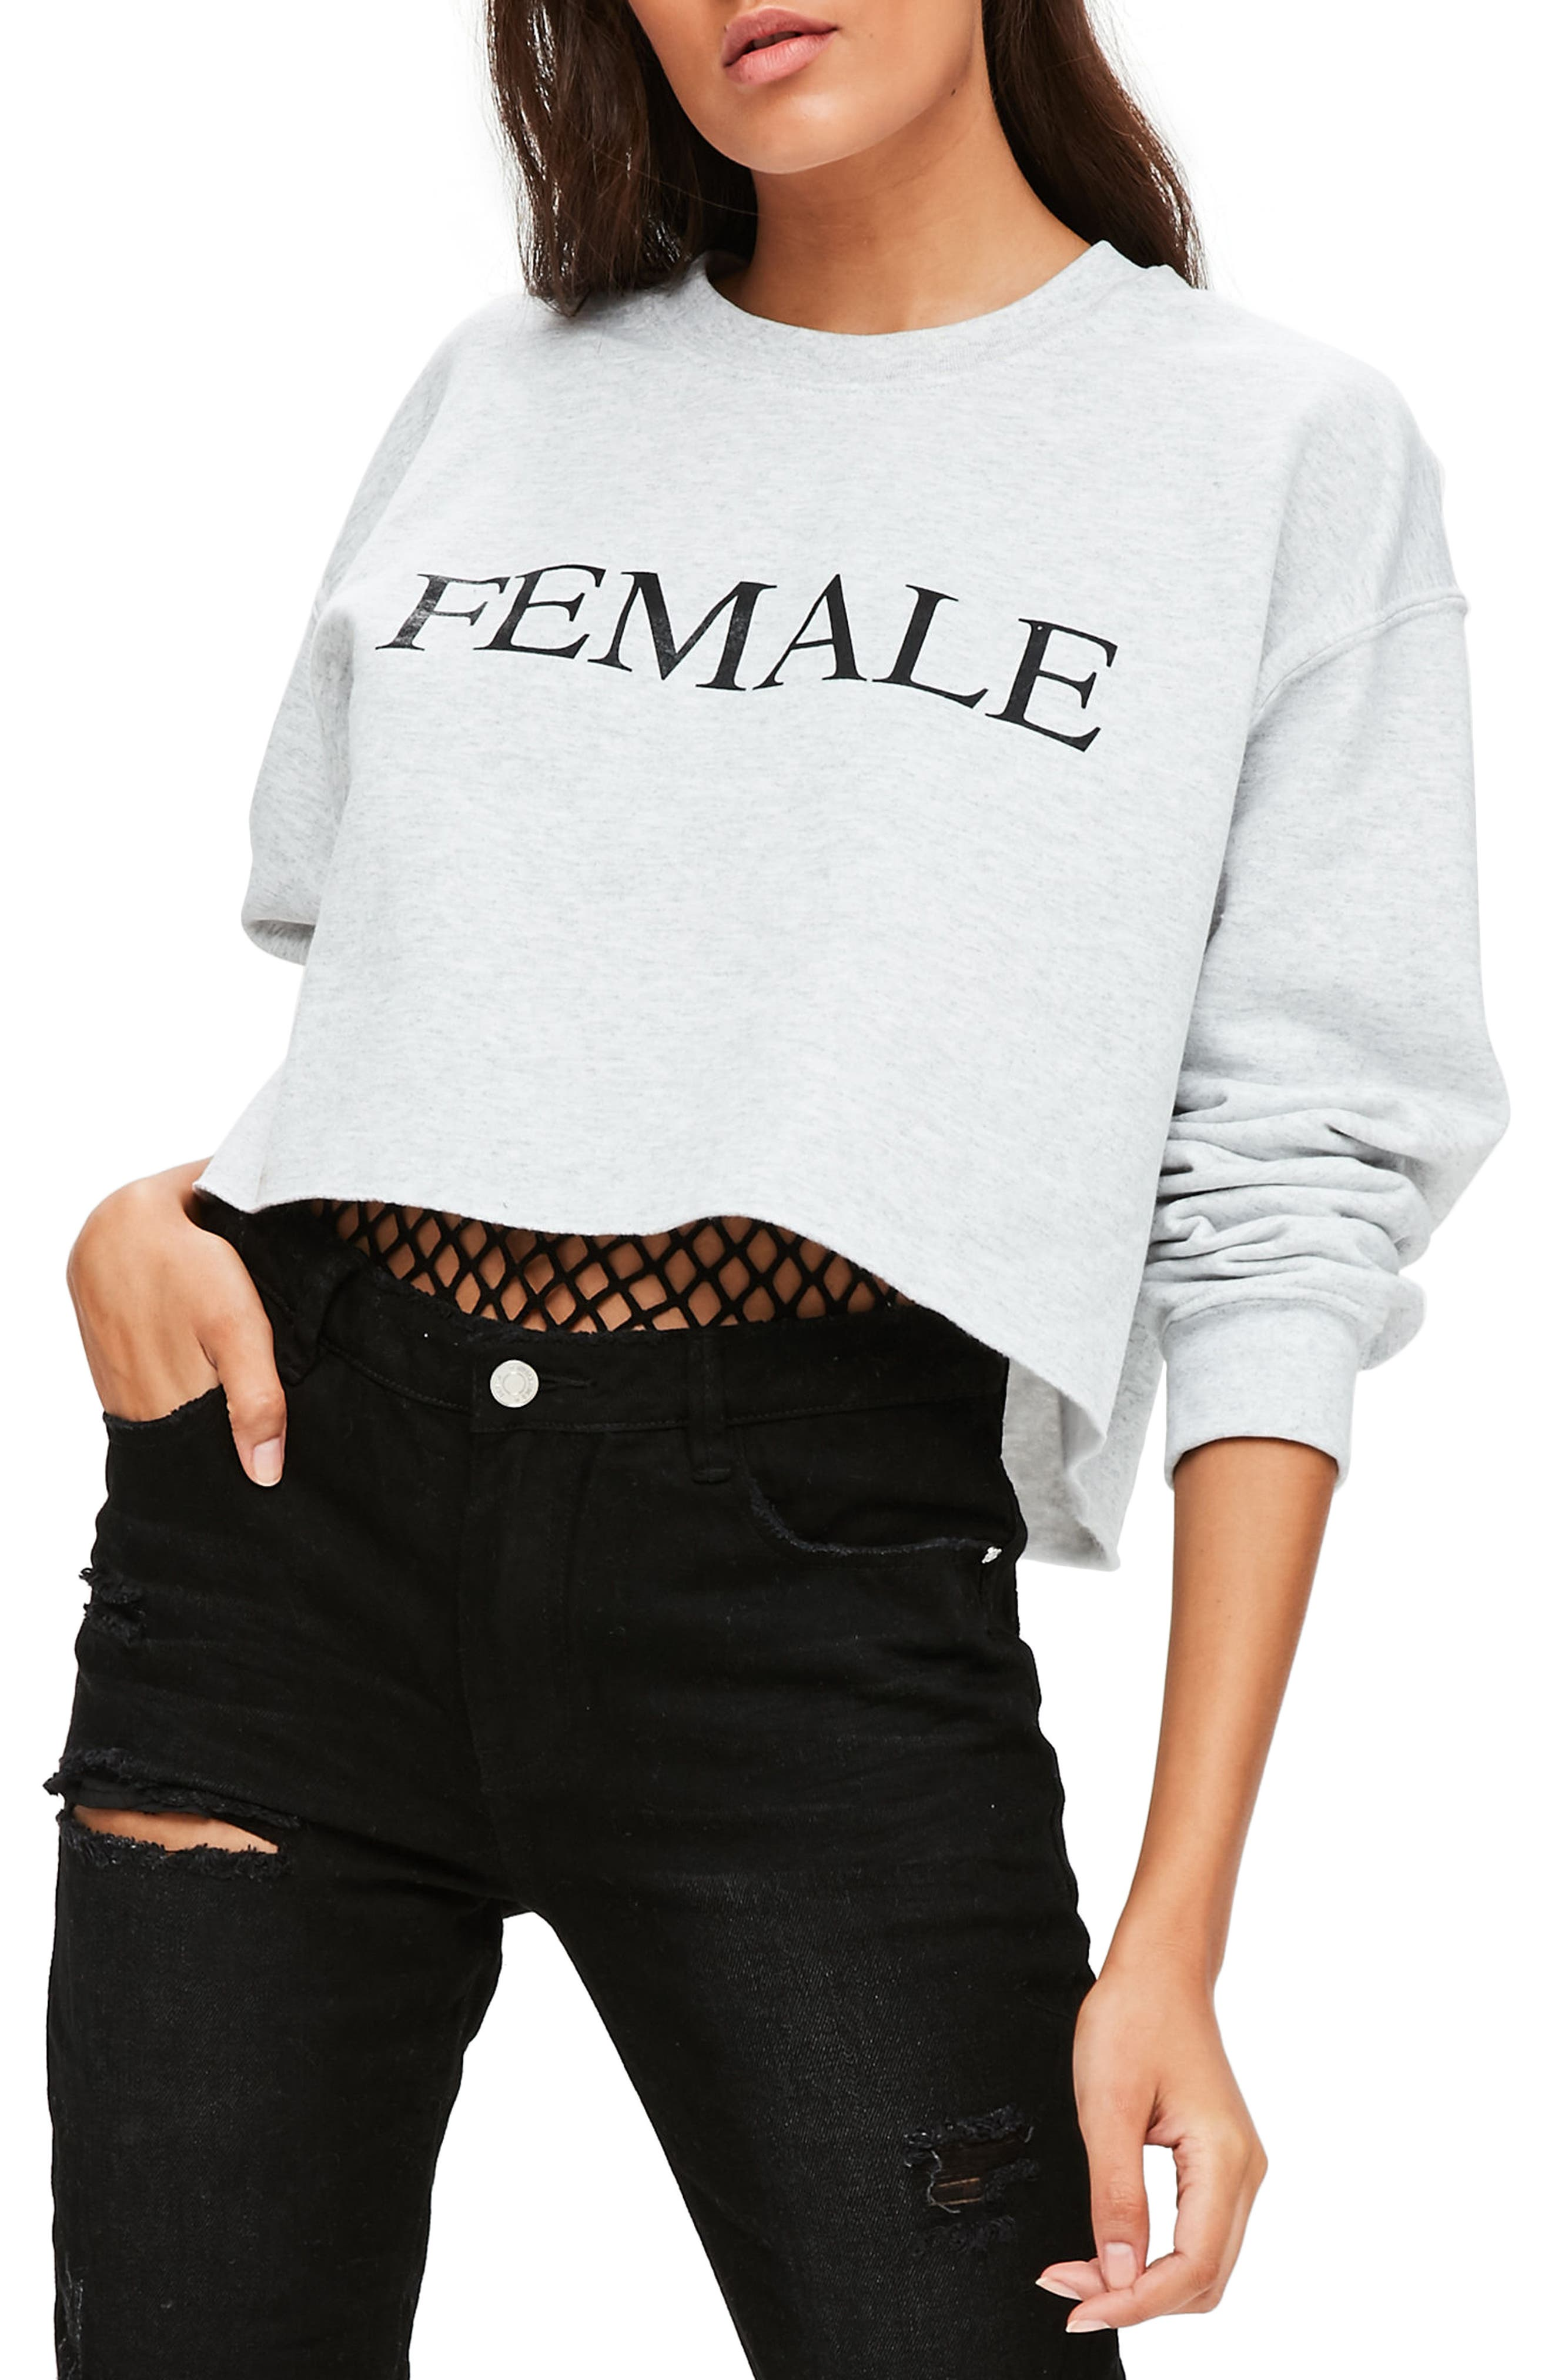 Missguided Female Sweatshirt